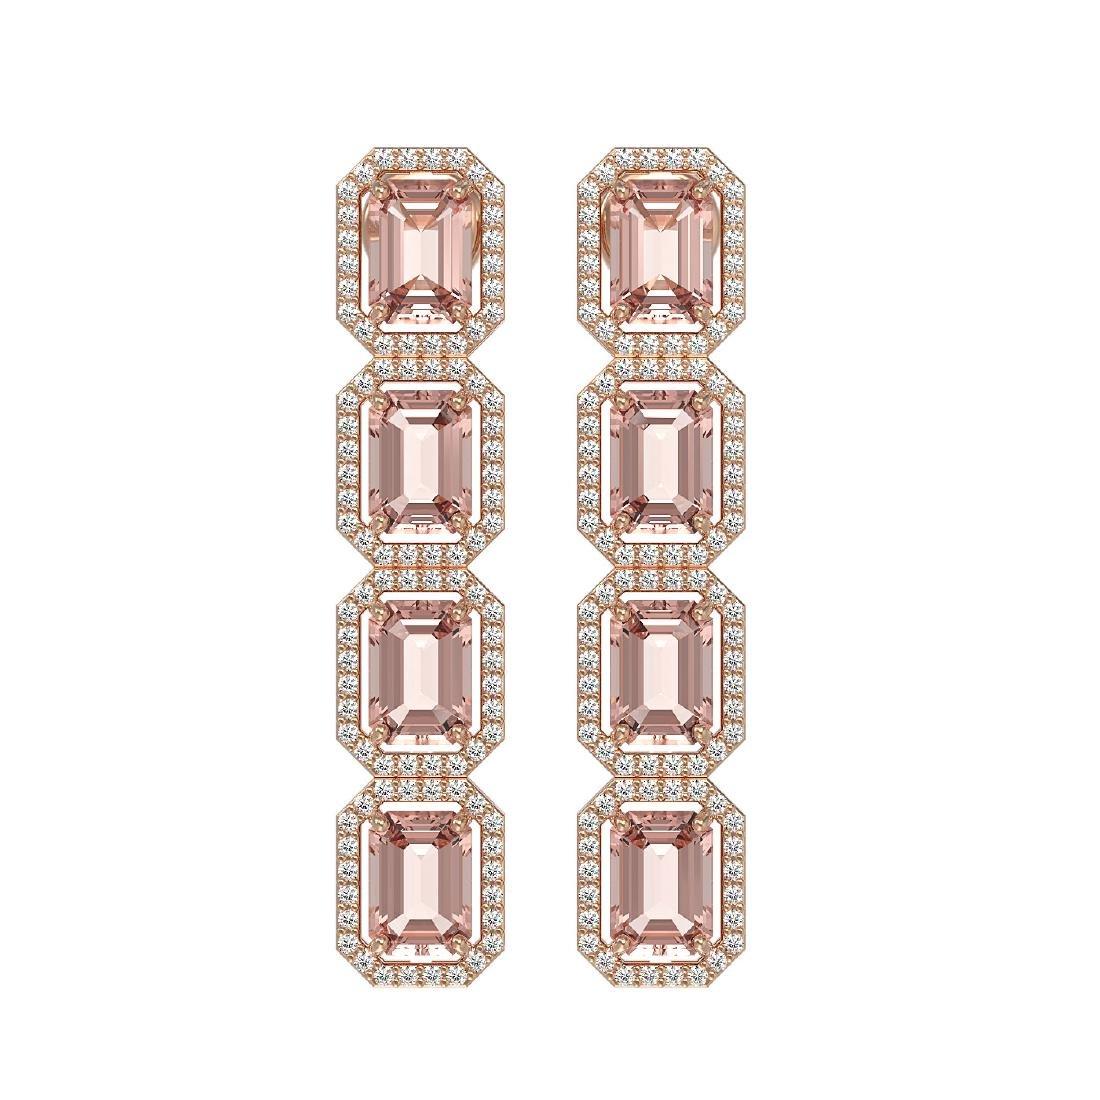 10.73 CTW Morganite & Diamond Halo Earrings 10K Rose